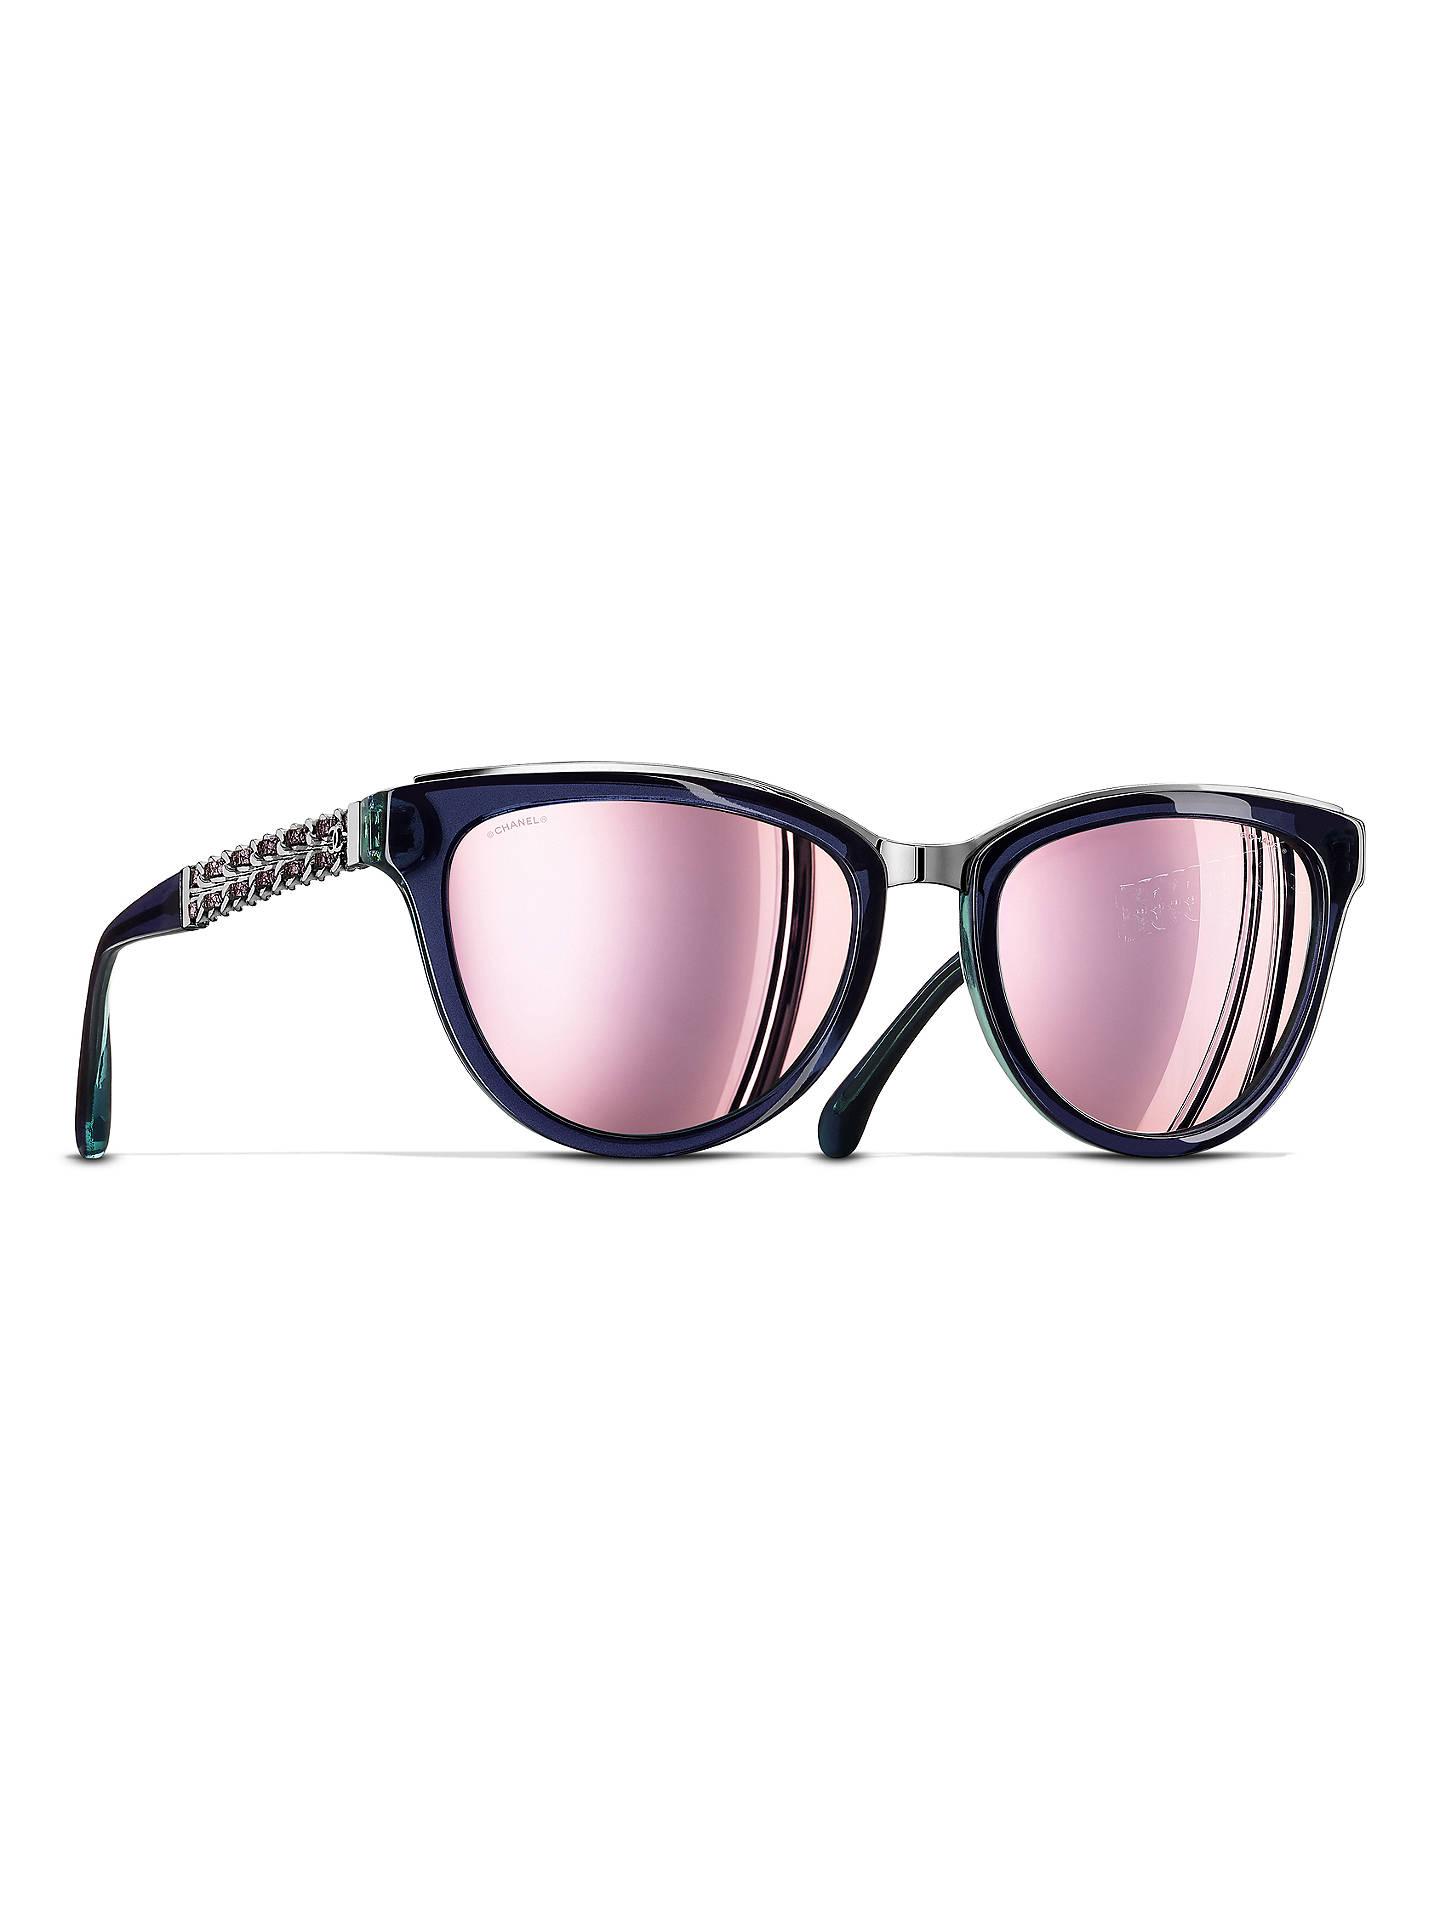 CHANEL Cat Eye Sunglasses CH5361Q Dark Blue at John Lewis & Partners